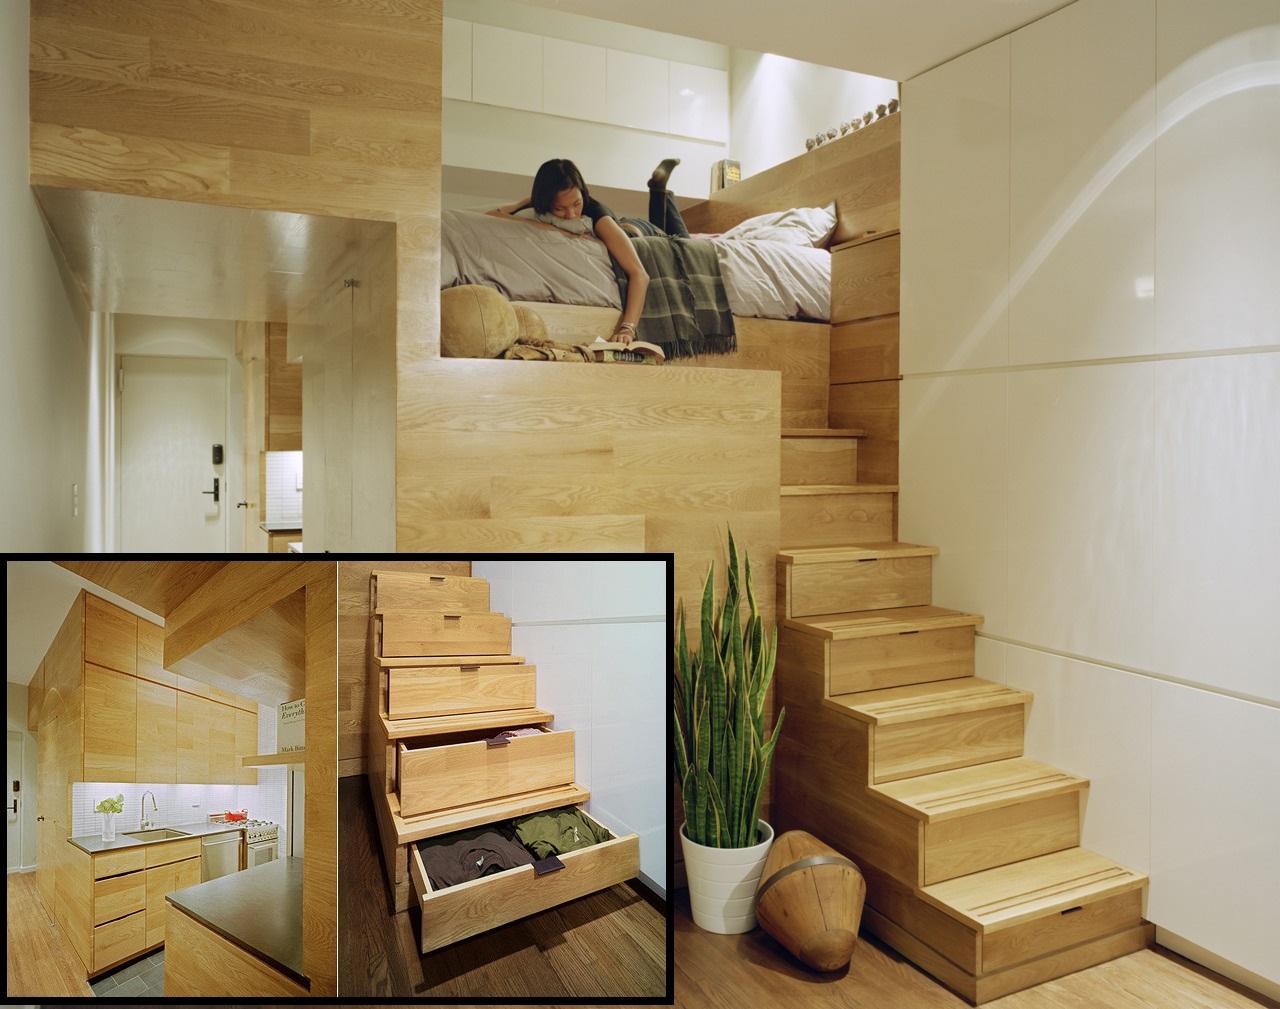 Small Apartment Interior Design Ideas | BlogLet.com